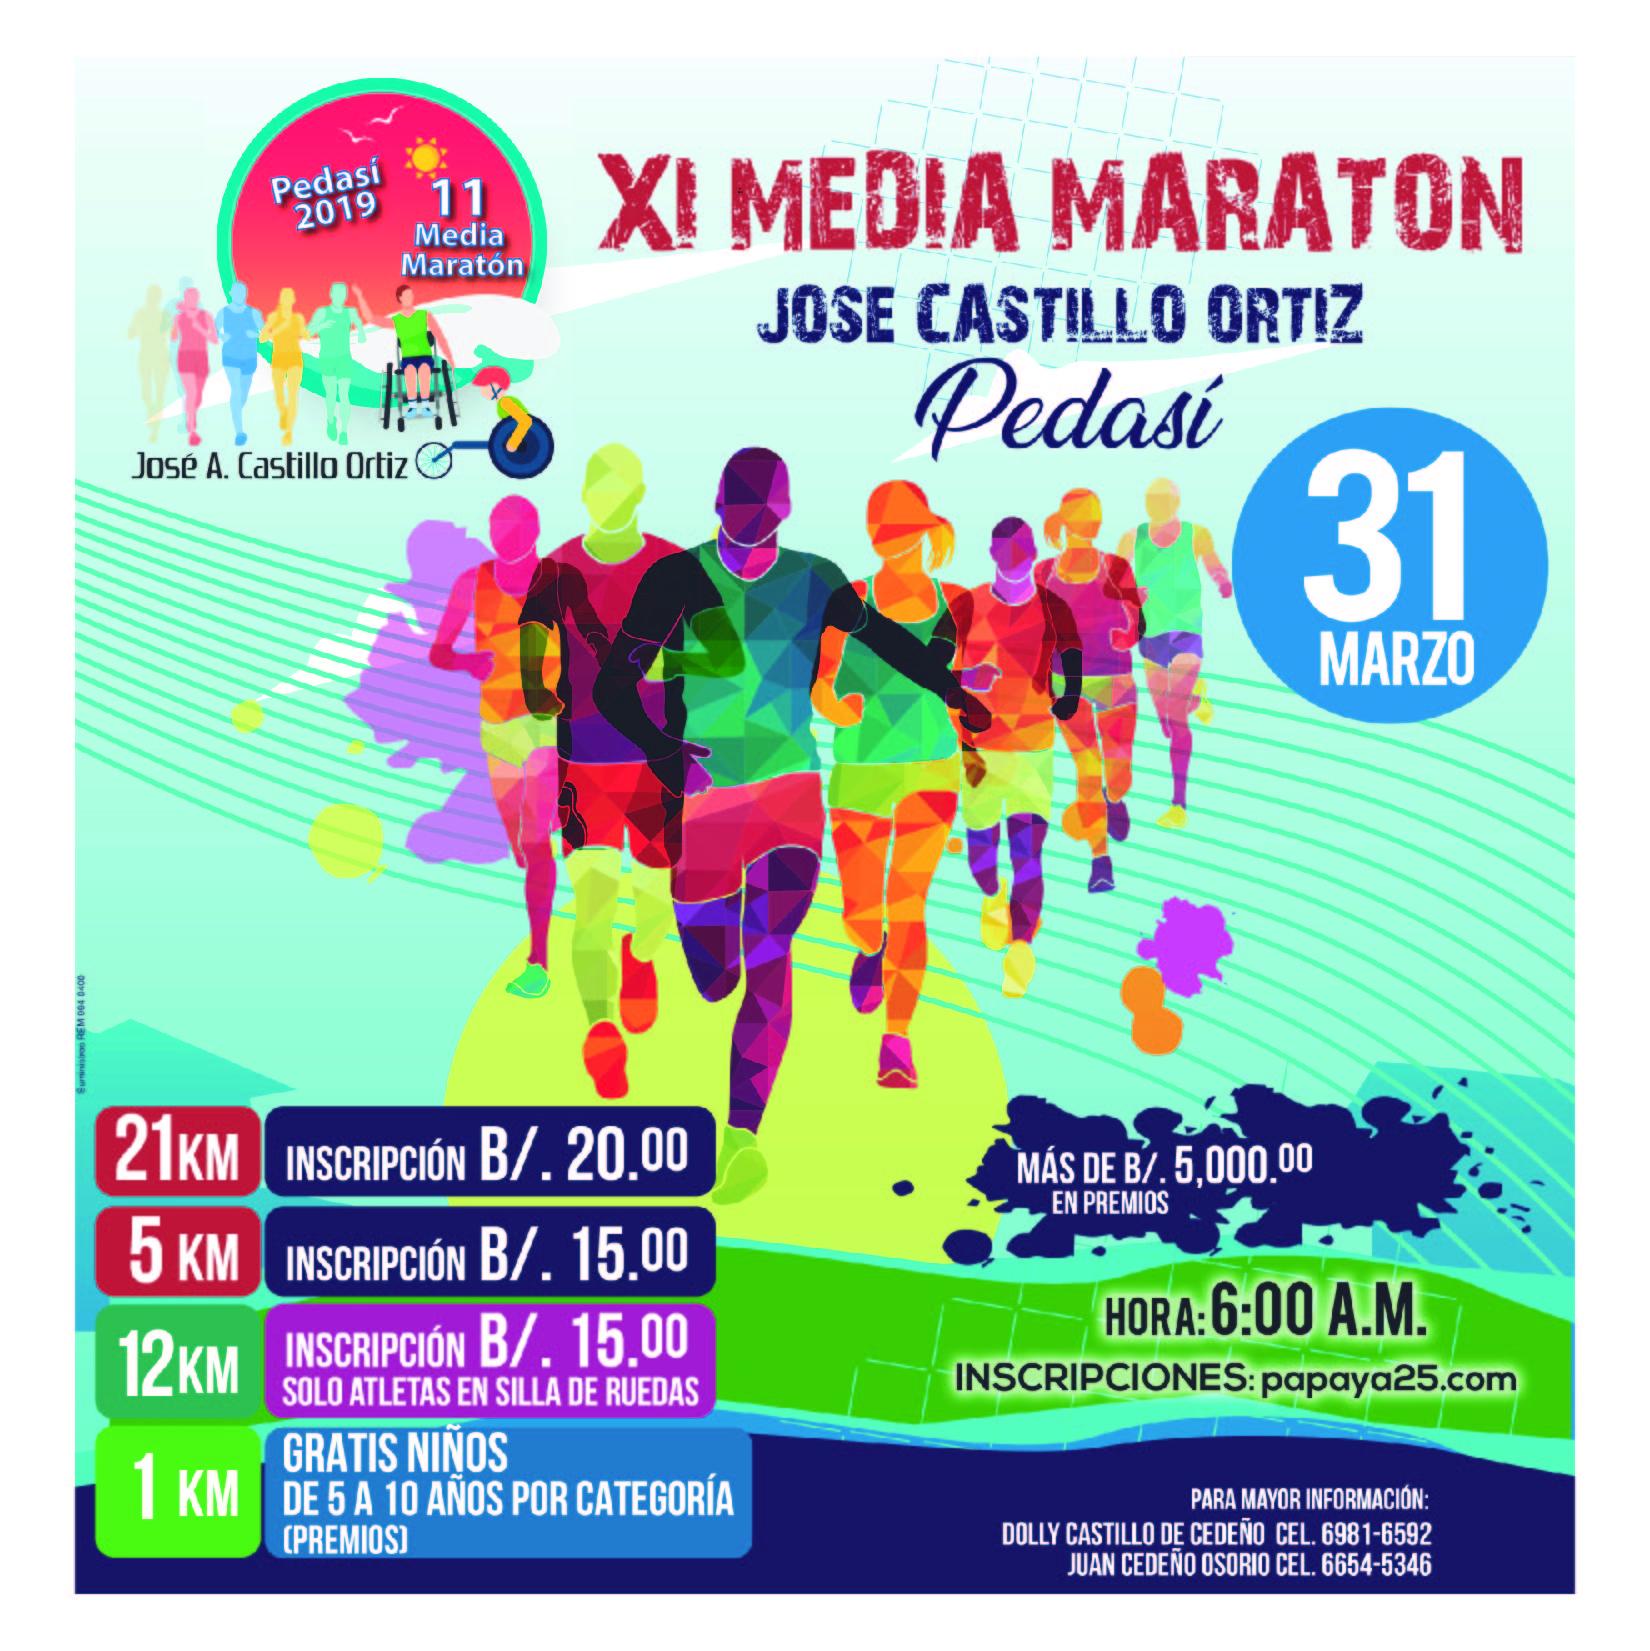 XI MEDIA MARATON JOSE CASTILLO PEDASI